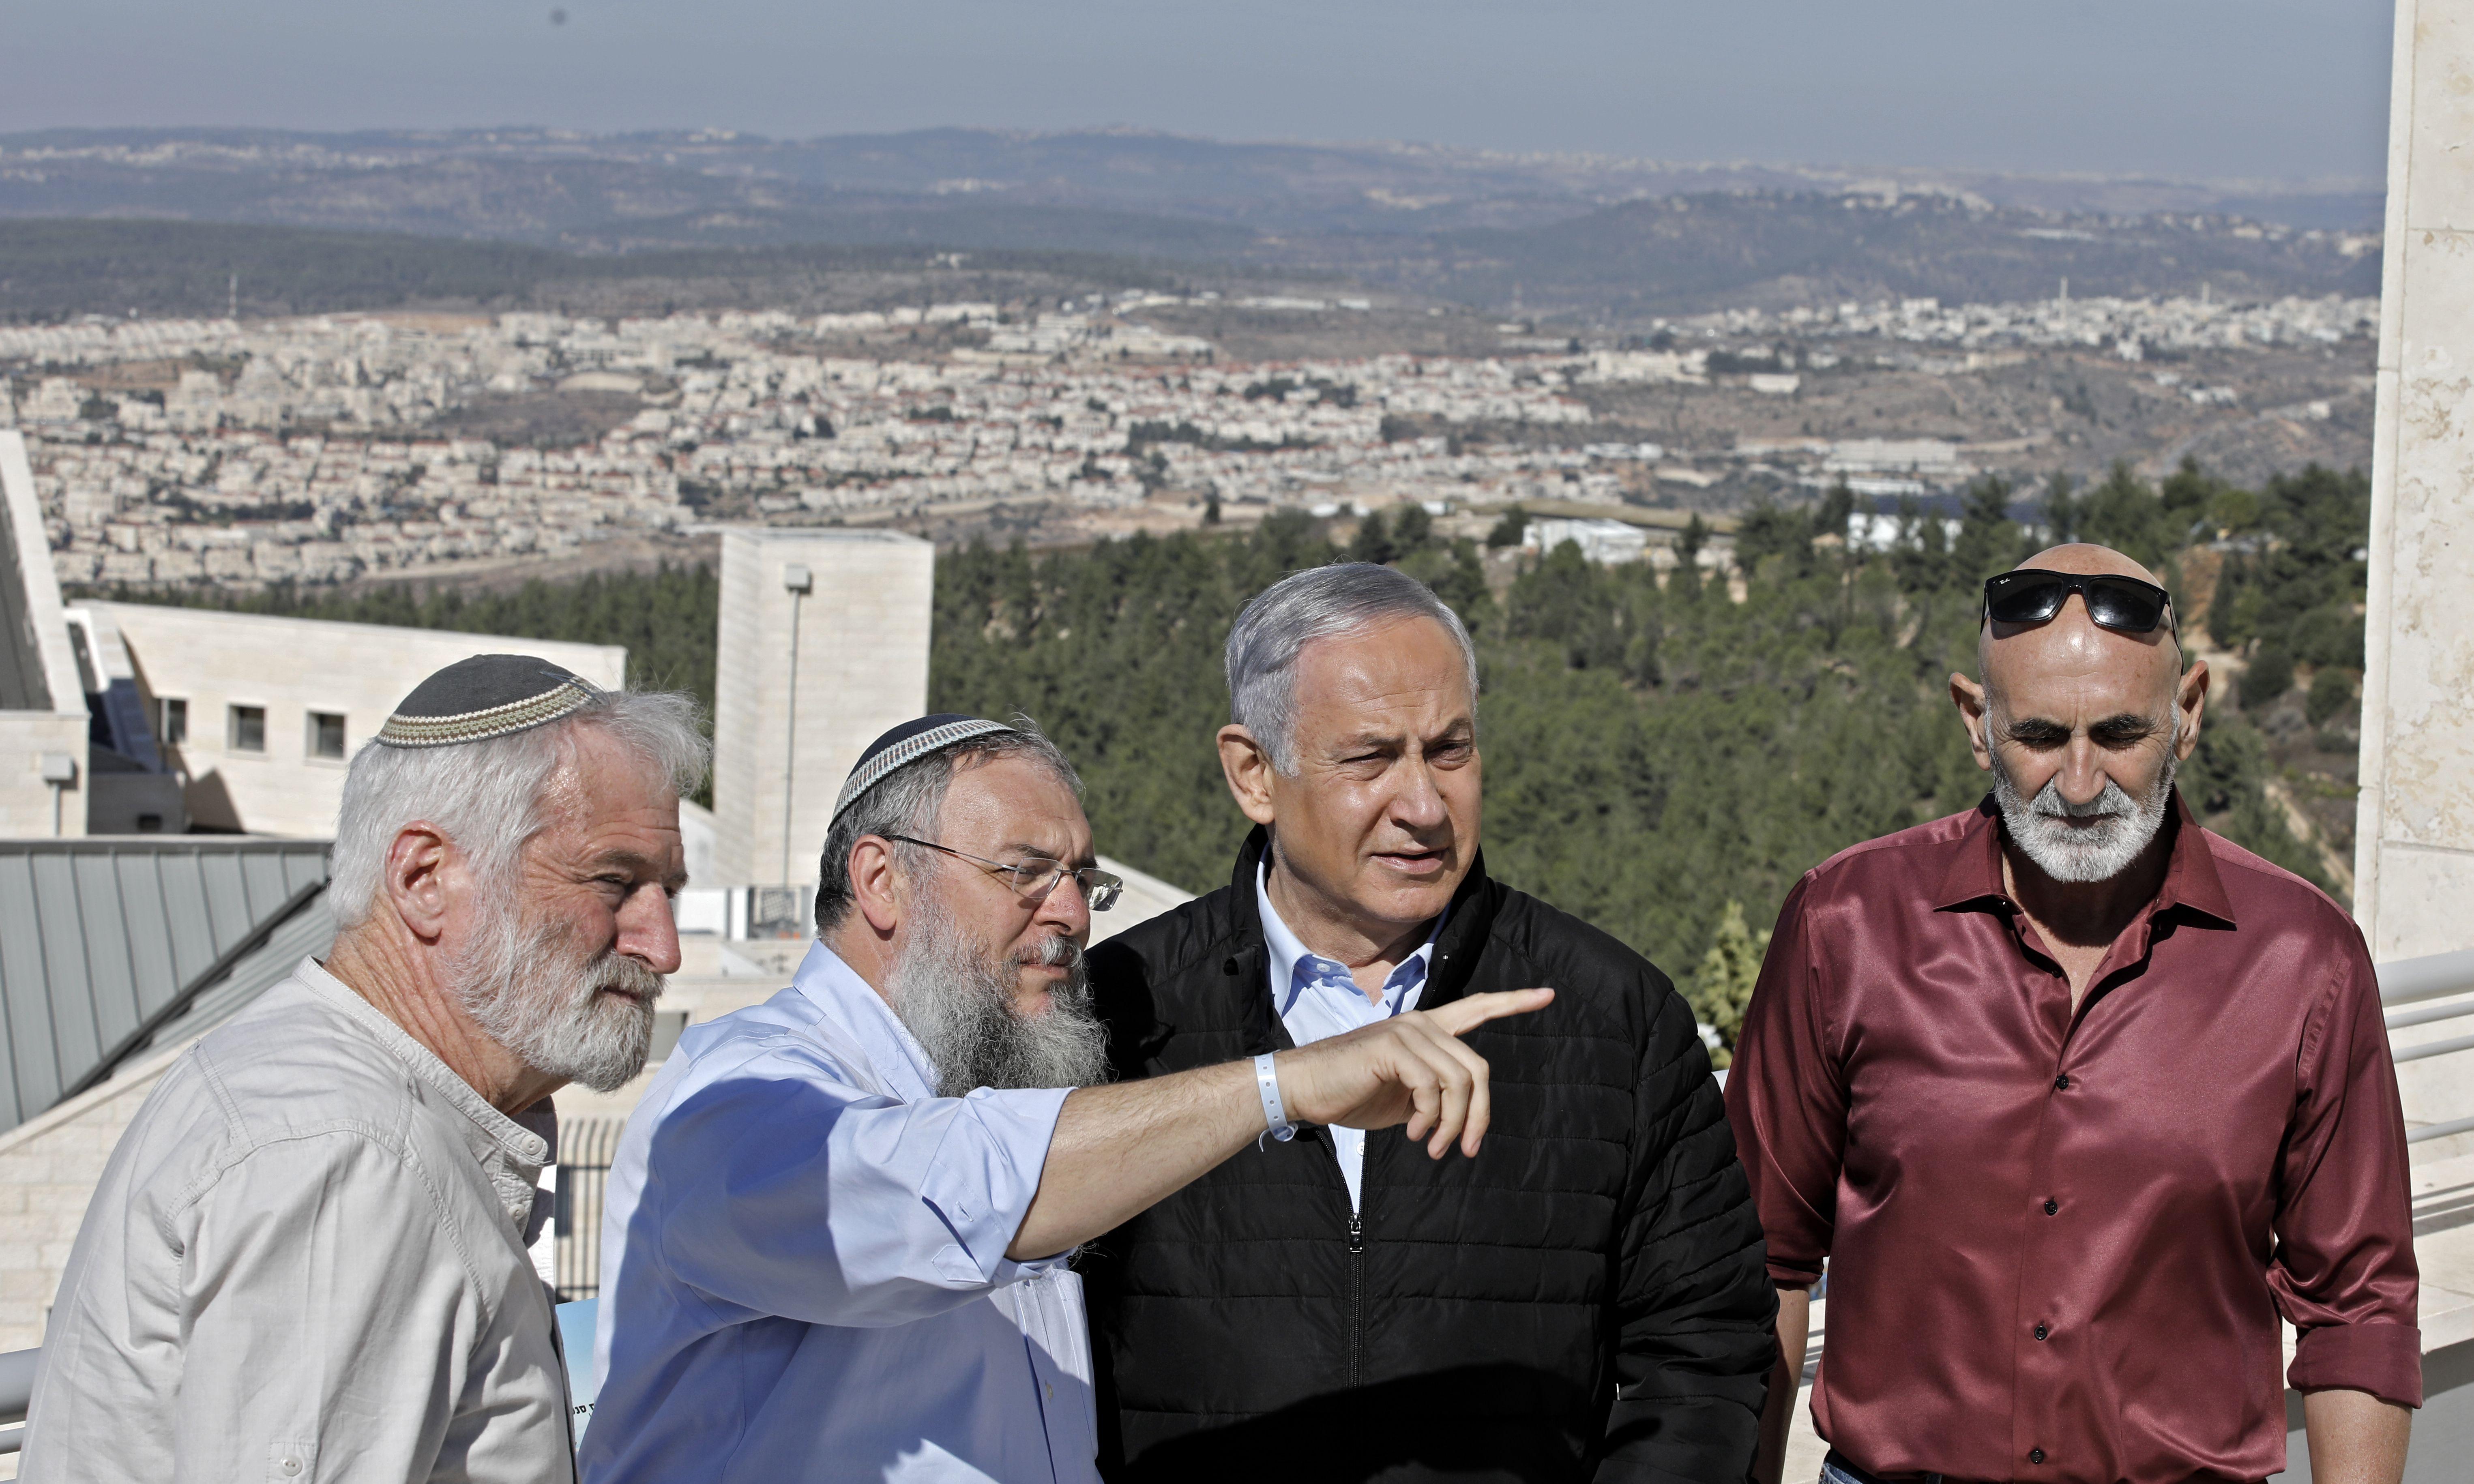 The Guardian view on Israeli settlements: still illegal